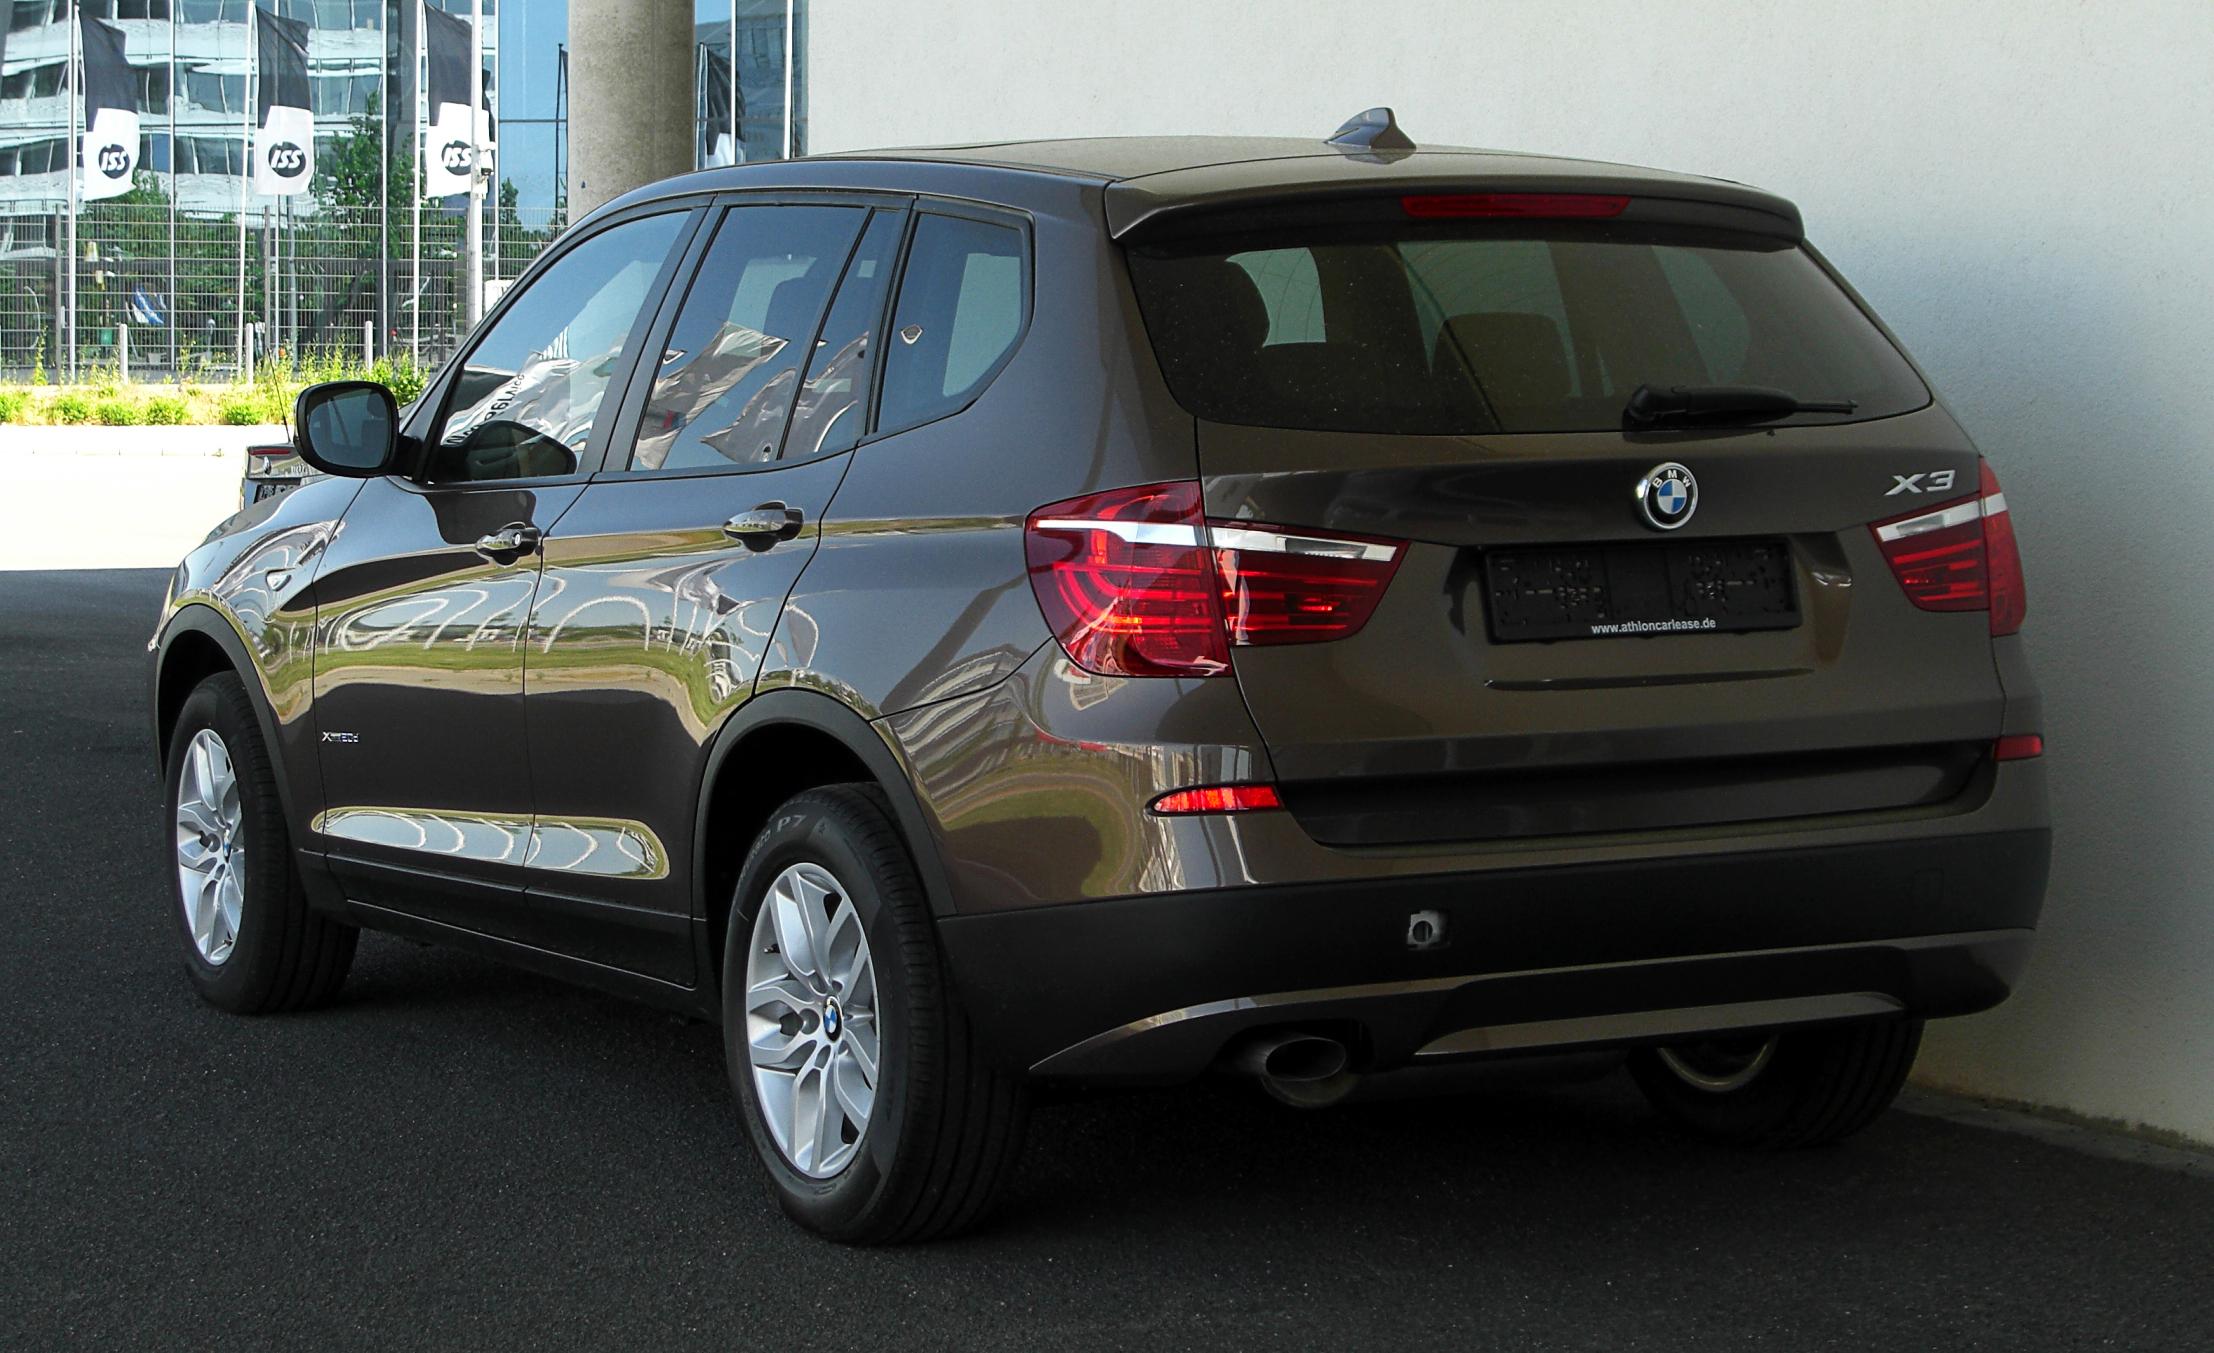 File:BMW X3 xDrive20d (F25) – Heckansicht, 1. Mai 2011, Düsseldorf ...